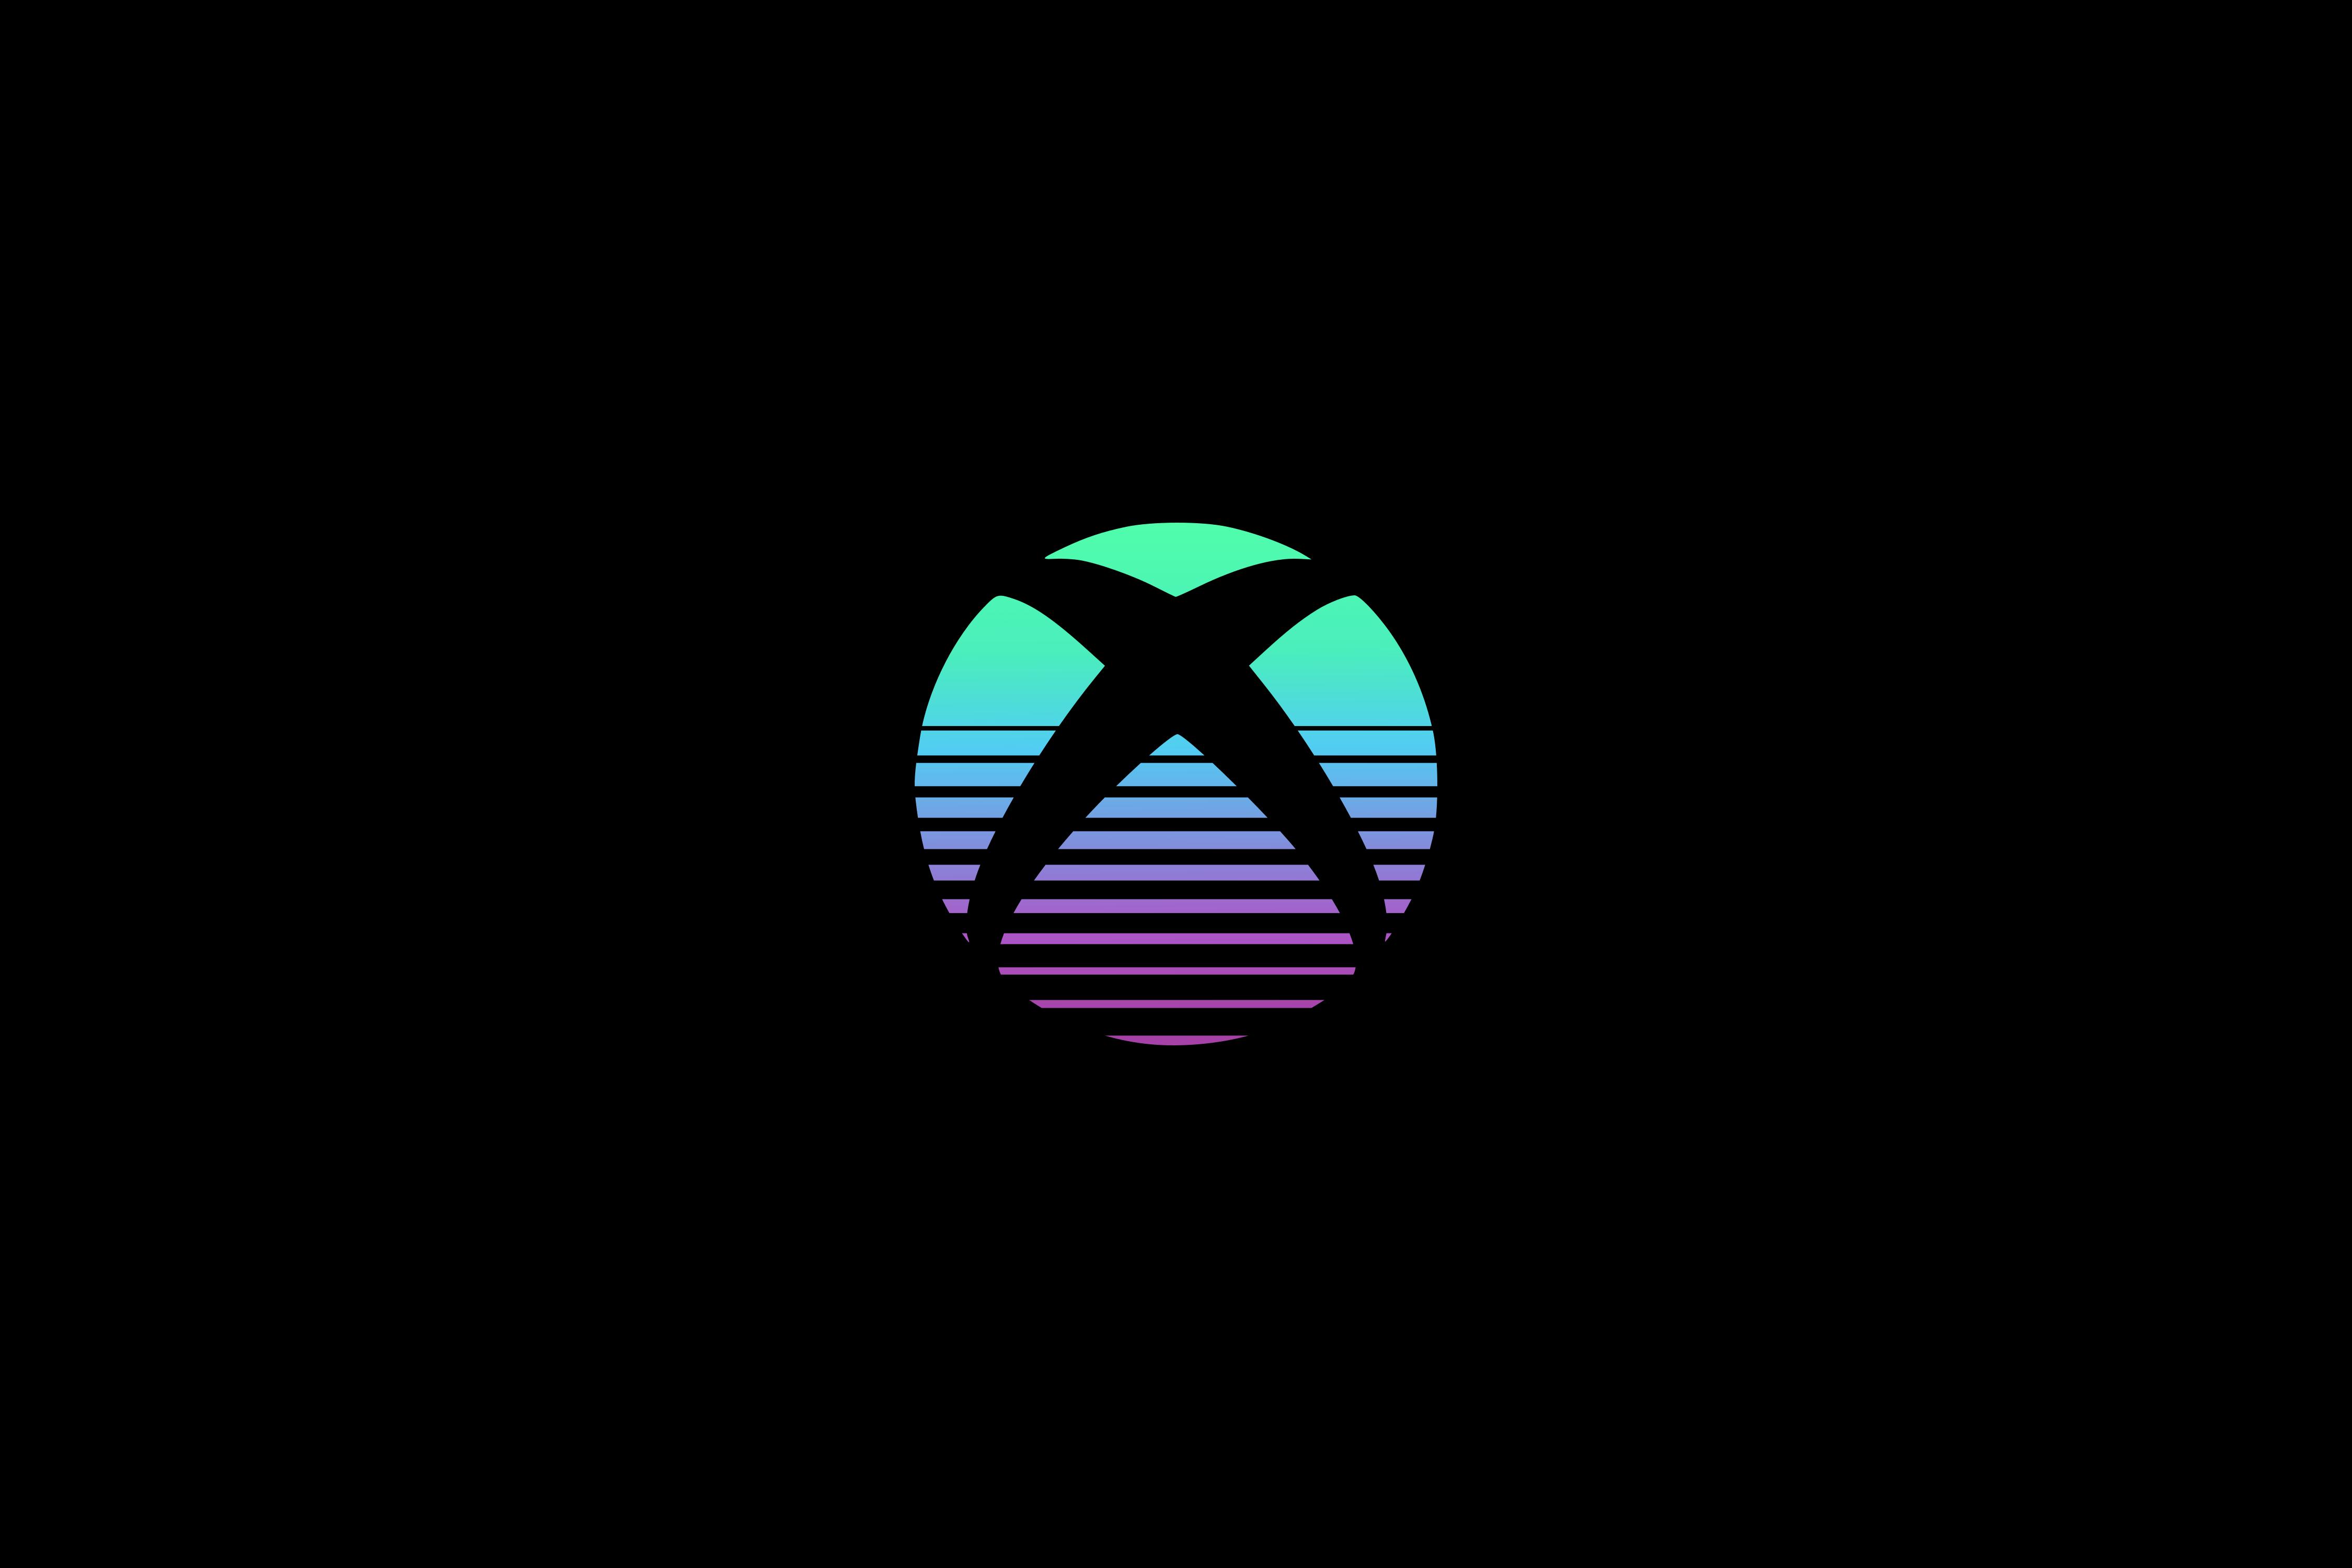 General 4500x3000 Xbox Microsoft consoles logo Retro style simple background gear lines black dark